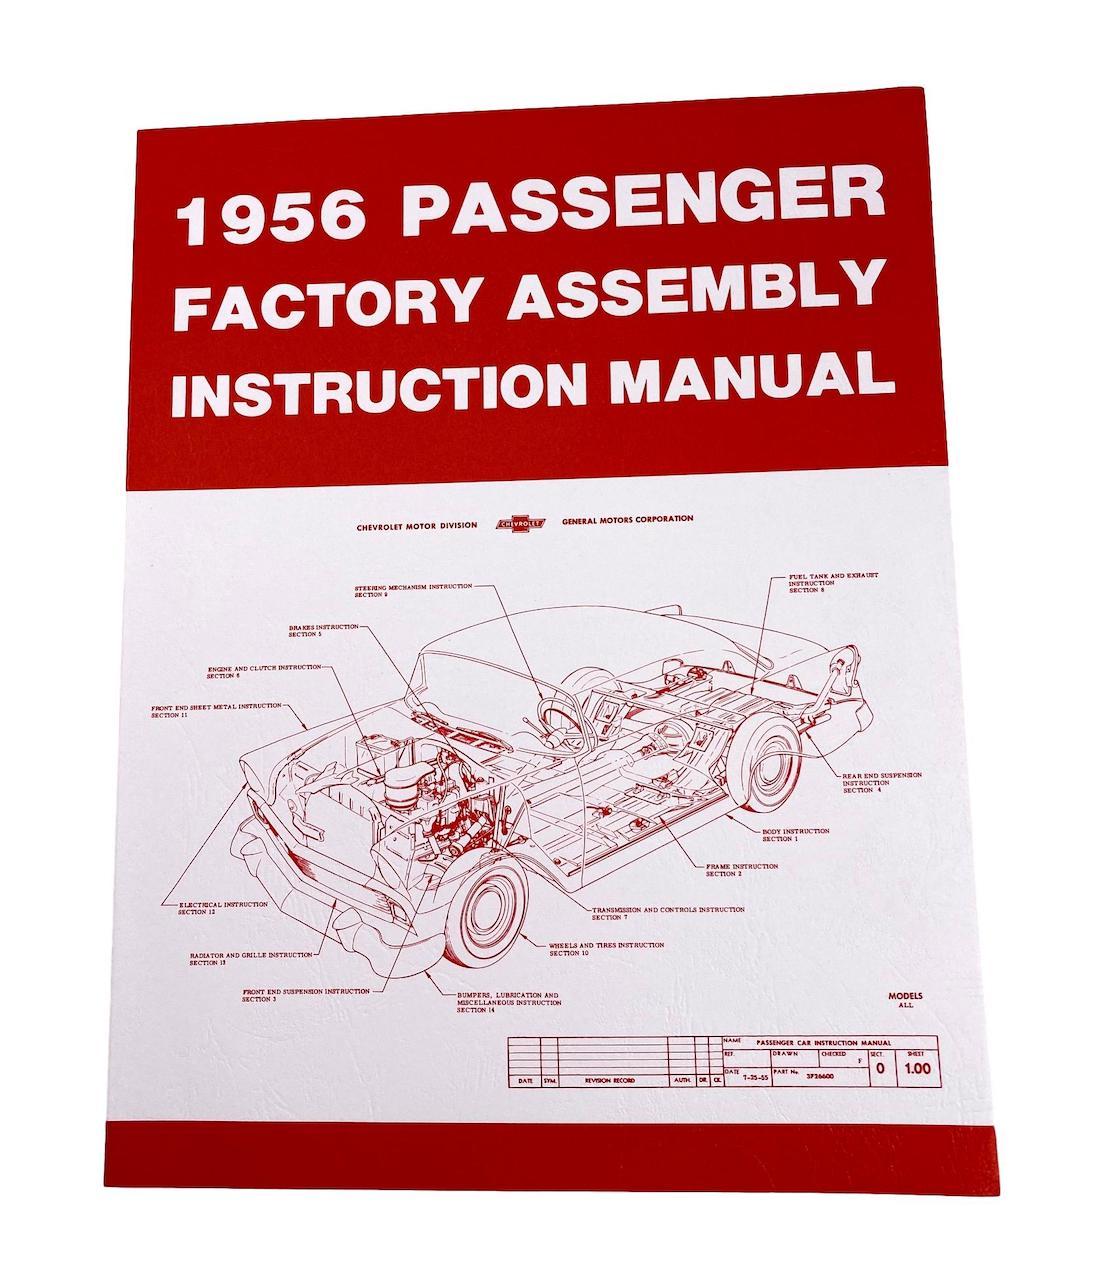 55 chevy wiring diagram 1955 chevy wiring diagram 1955 chevy wiring diagram 1955 chevy wiring diagram